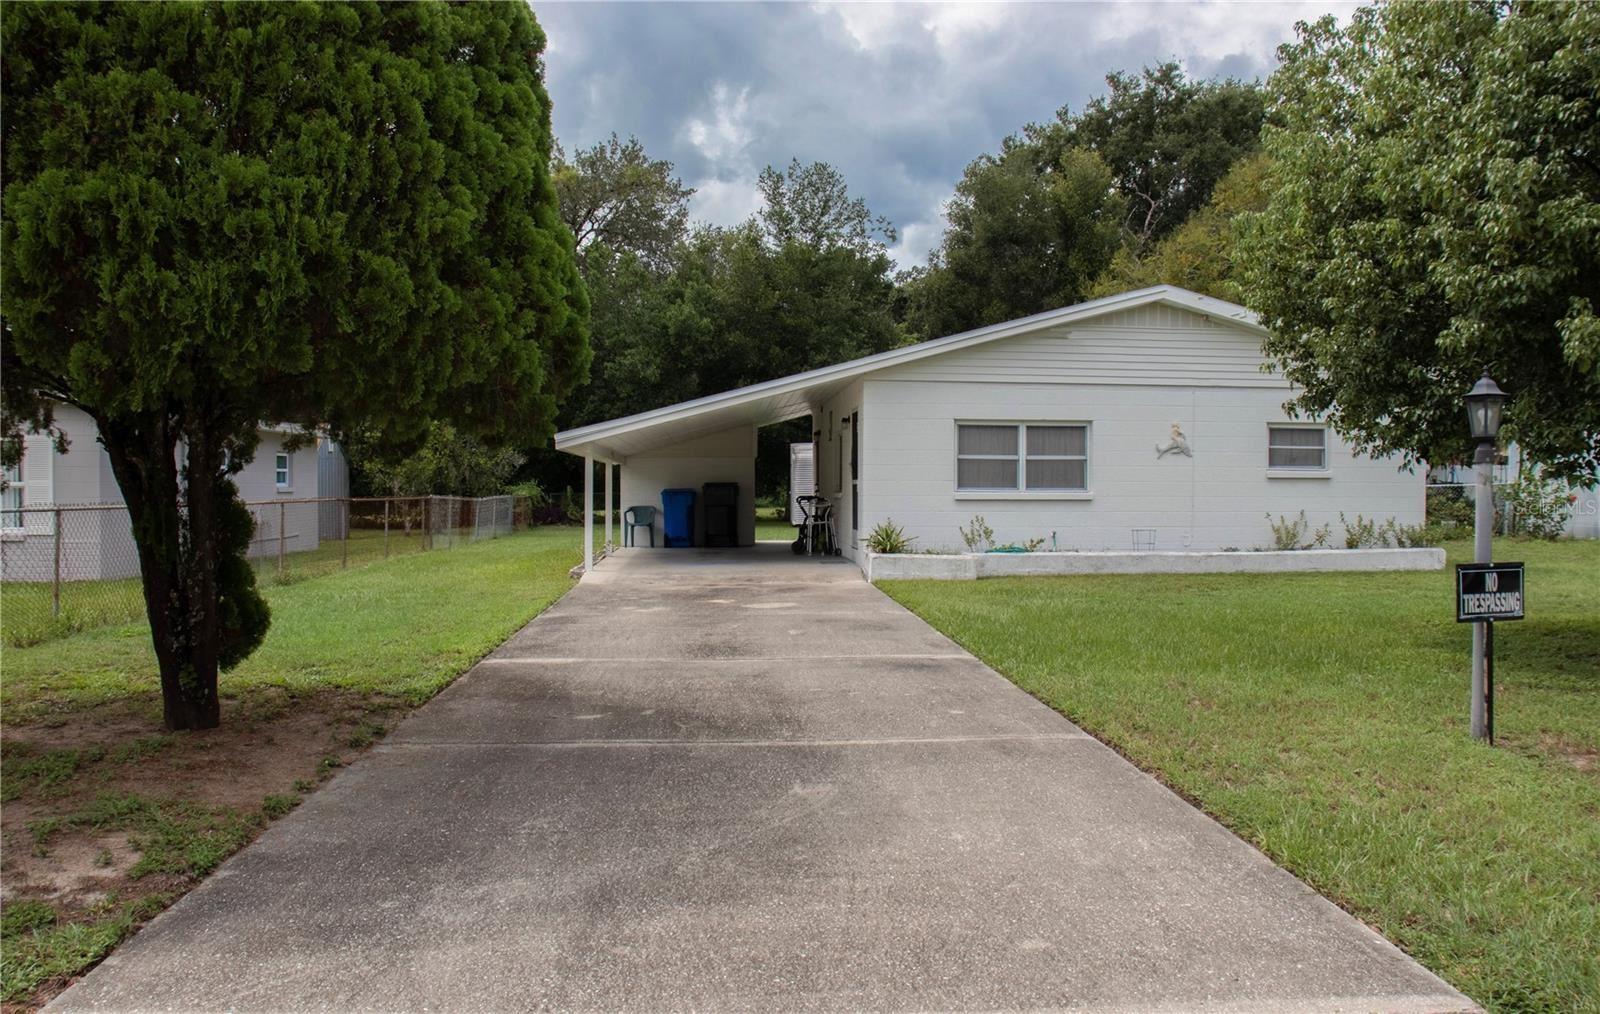 1011 KENMORE DRIVE, Brandon, FL 33510 - MLS#: T3329928